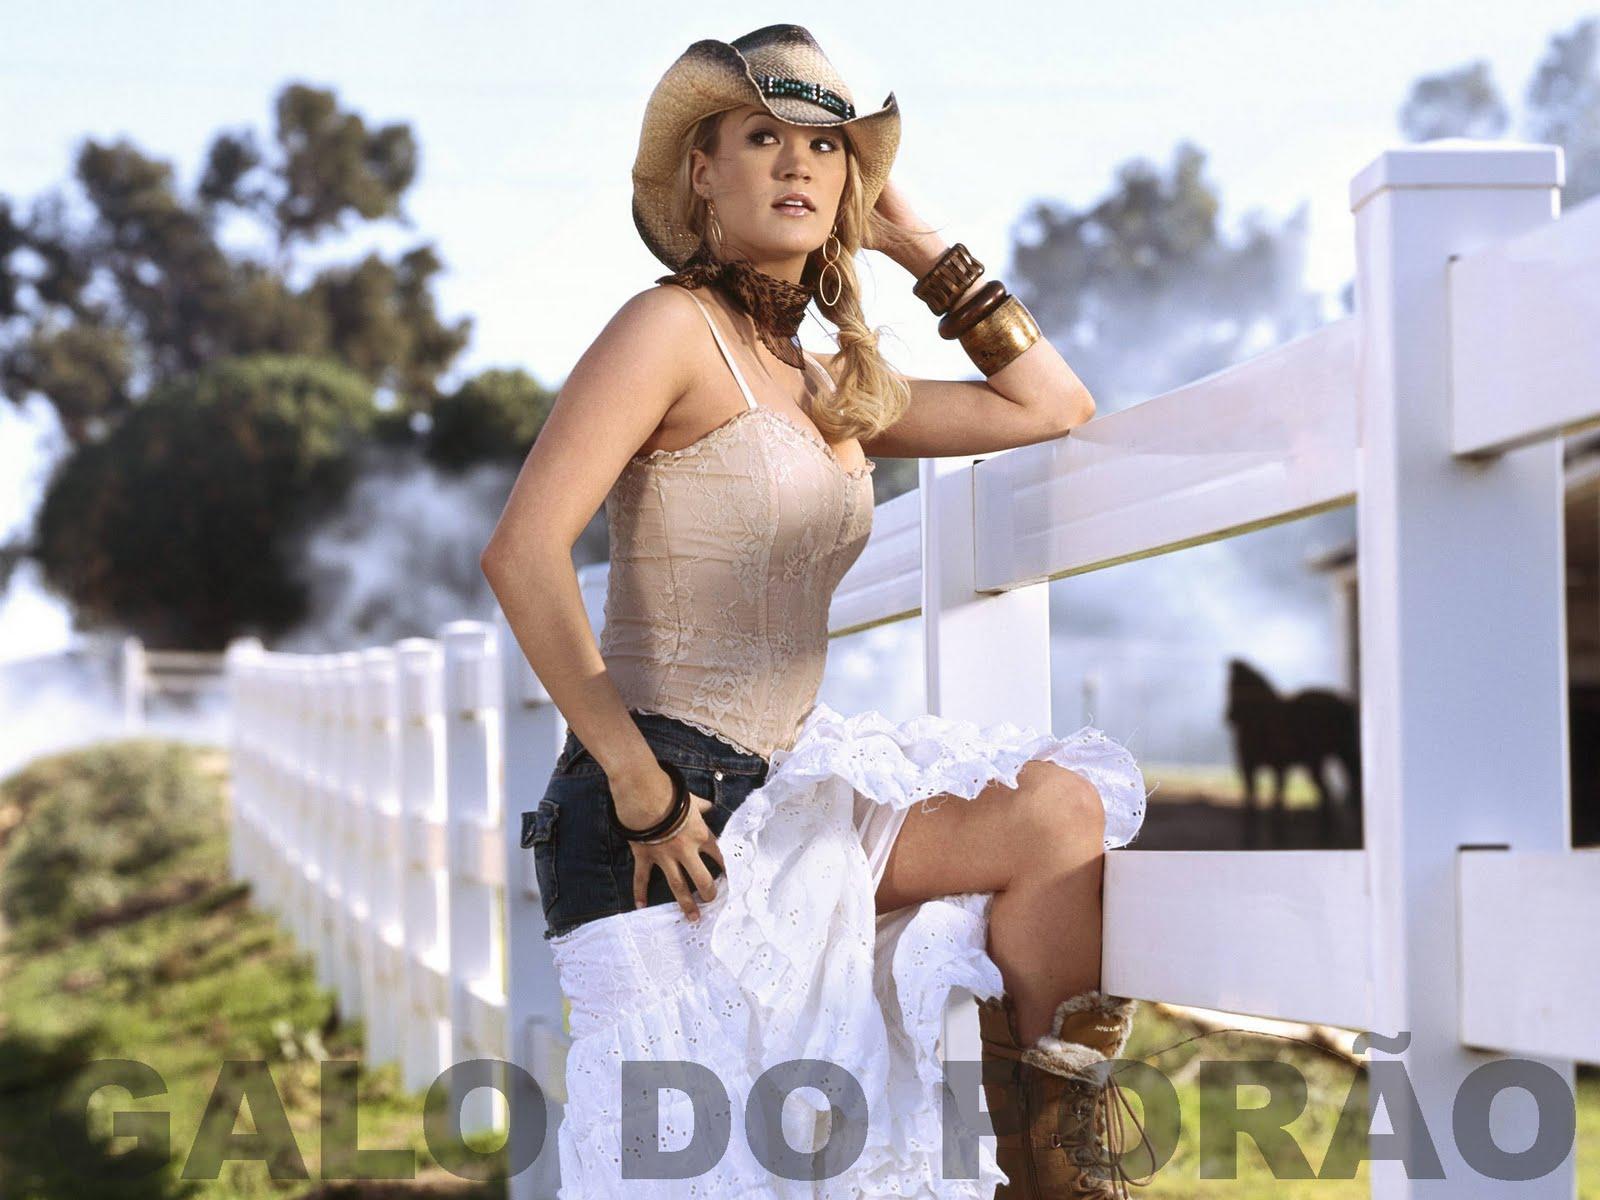 http://1.bp.blogspot.com/_6QURoNy4-5k/S9XI1RigSYI/AAAAAAAAEbM/GP4_gBO7hls/s1600/w02-Carrie+Underwood.jpg